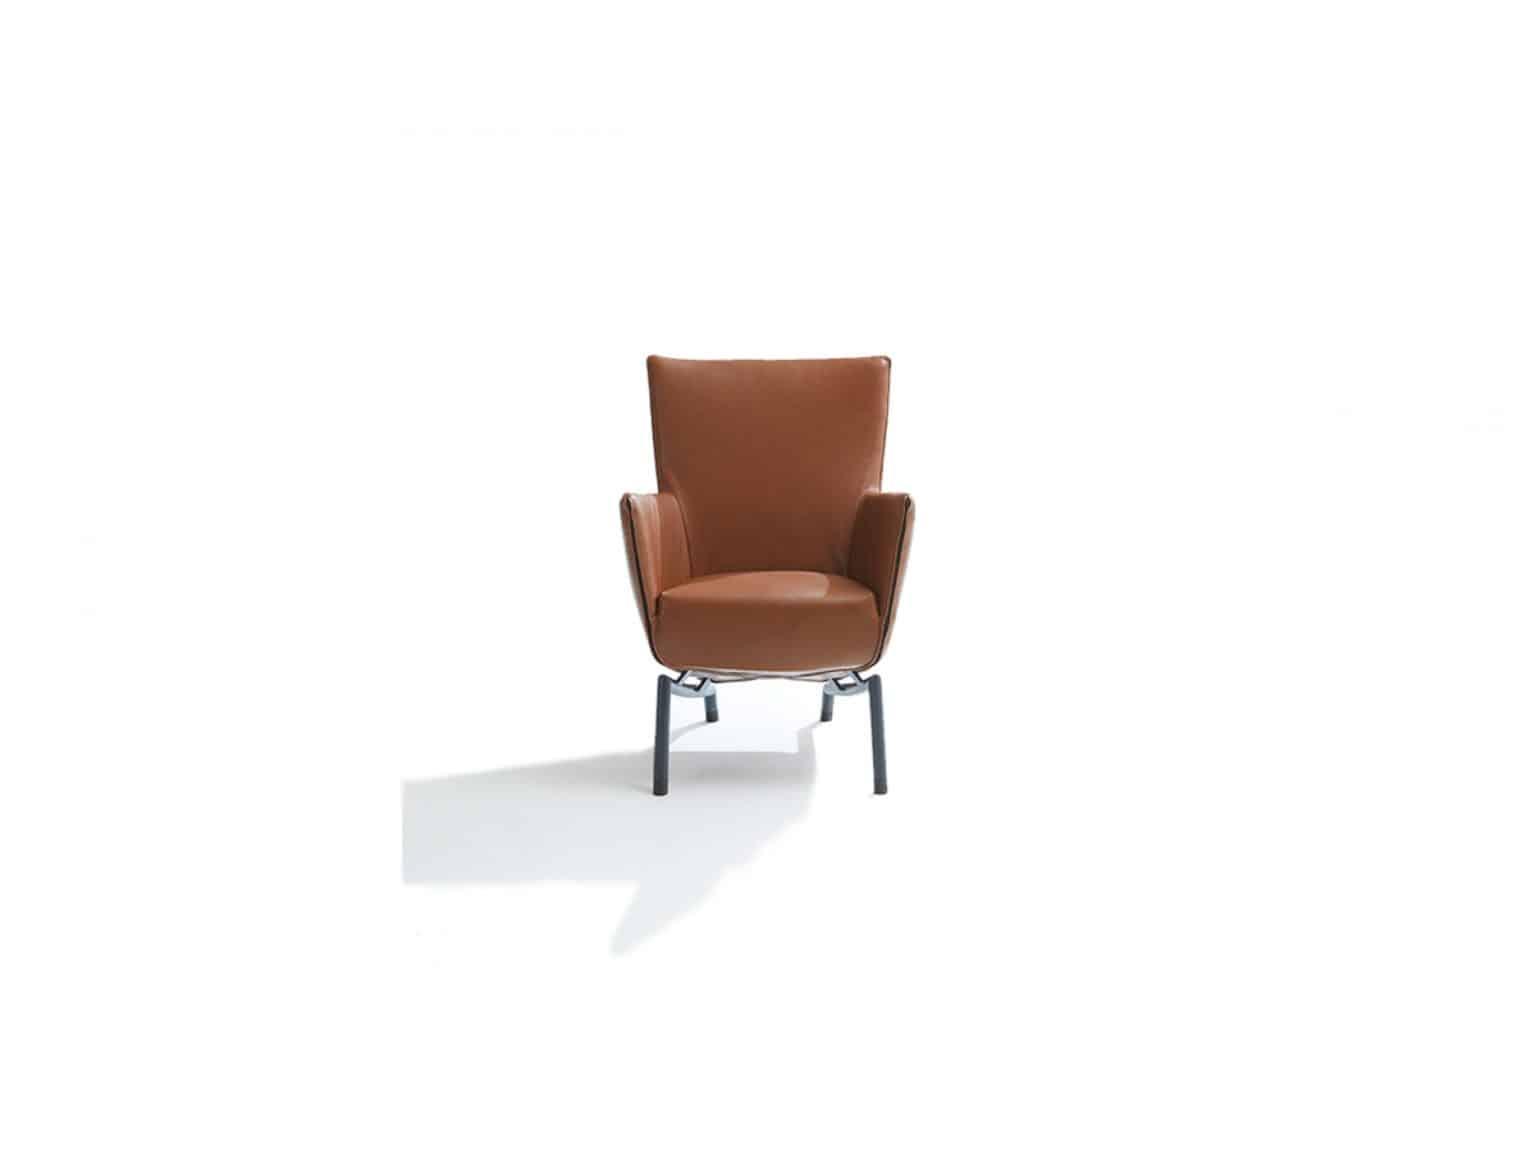 Label fauteuil Foxxy pa